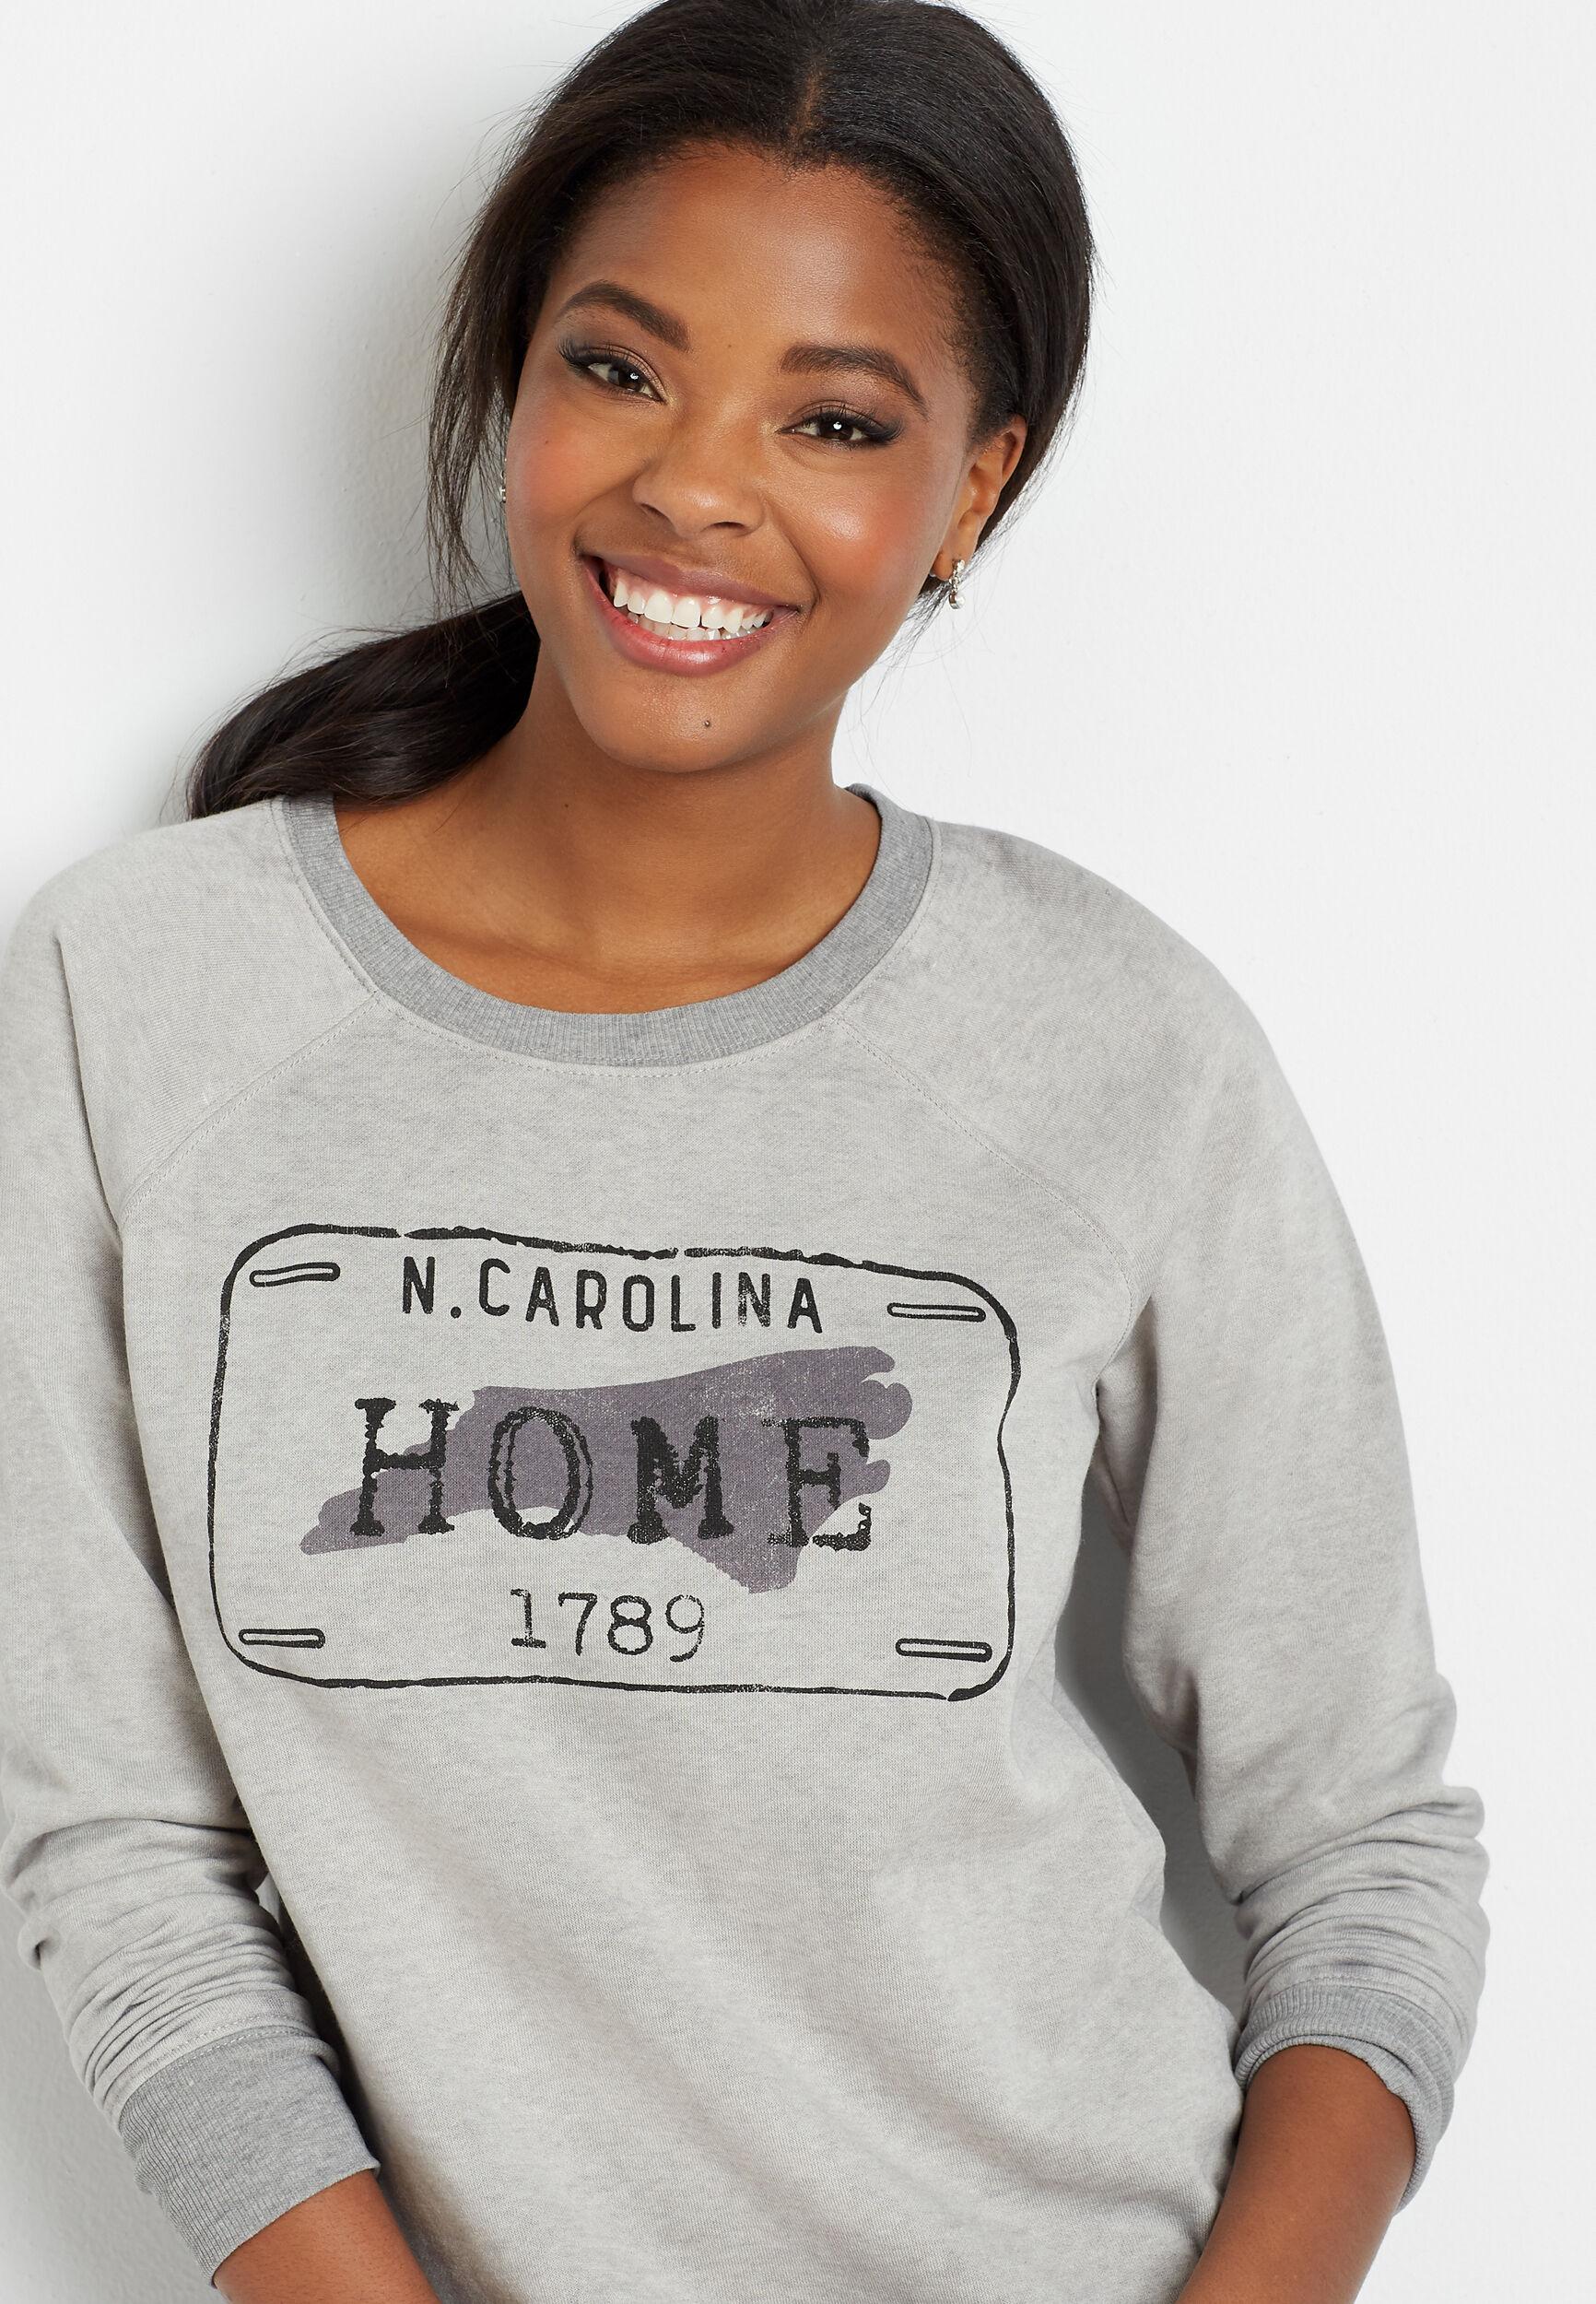 Maurices Womens Gray North Carolina Crew Neck Sweatshirt  -  Medium